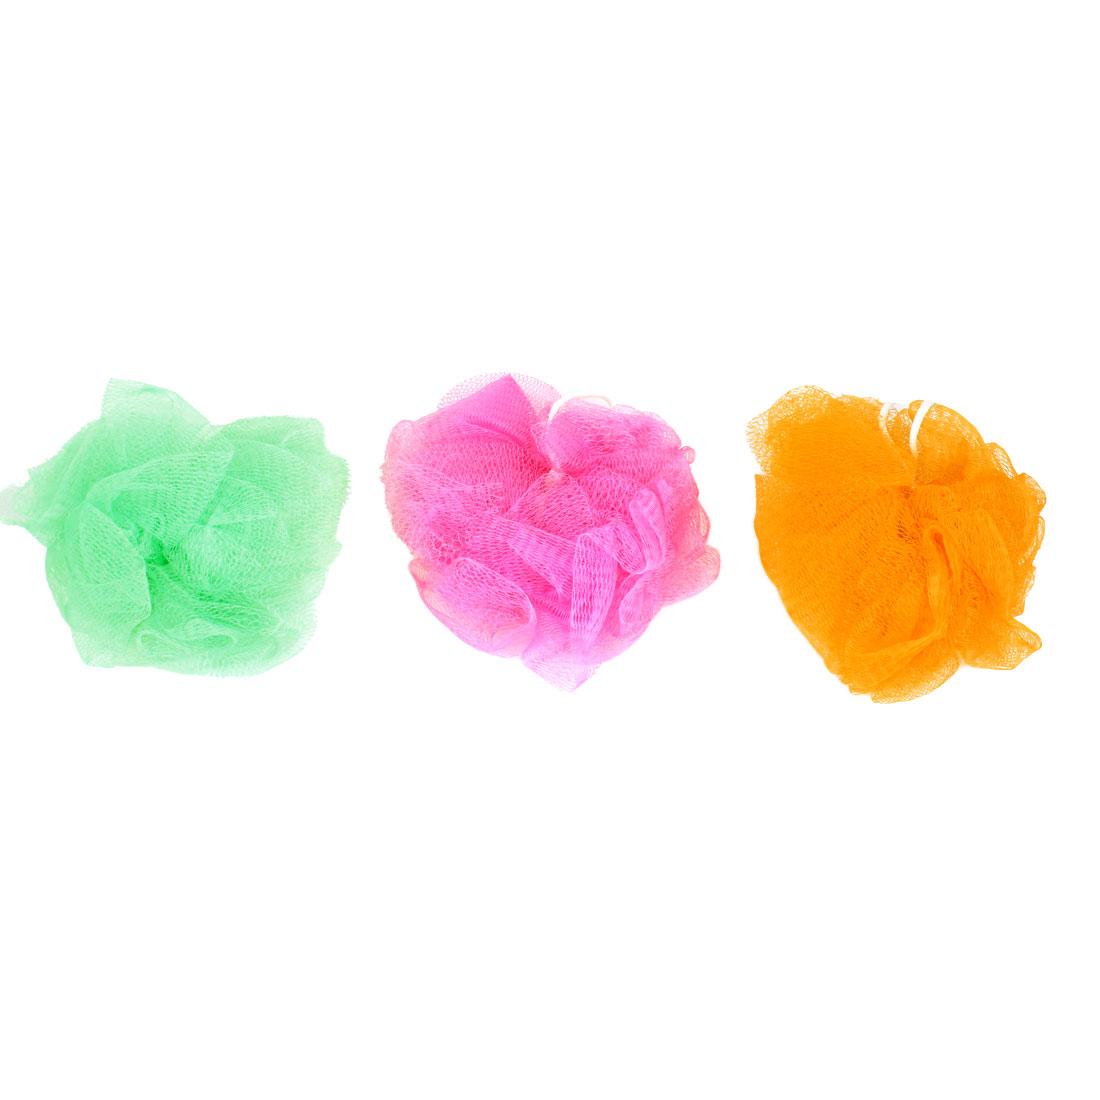 3 Pcs Tri-color Nylon Mesh Bath Shower Flower Ball w Hanging Loop